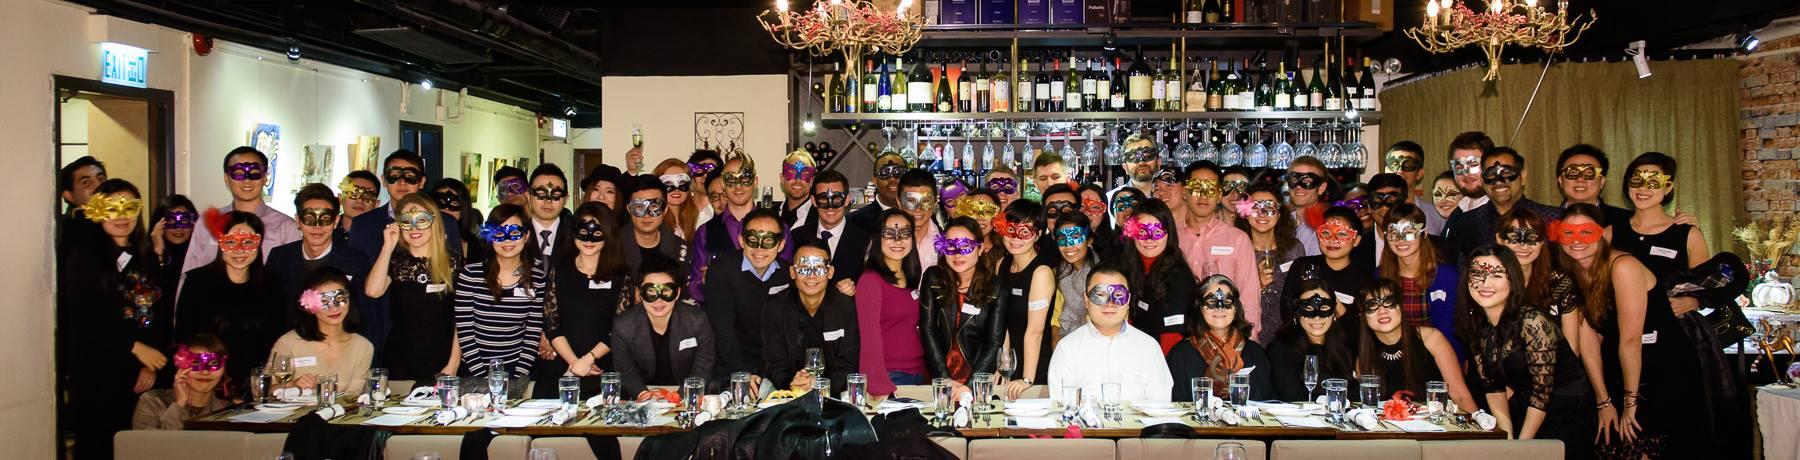 Full Service Bar with Cocktail Canapés - HKUST MBA Alumni Association Masquerade Ball 2017